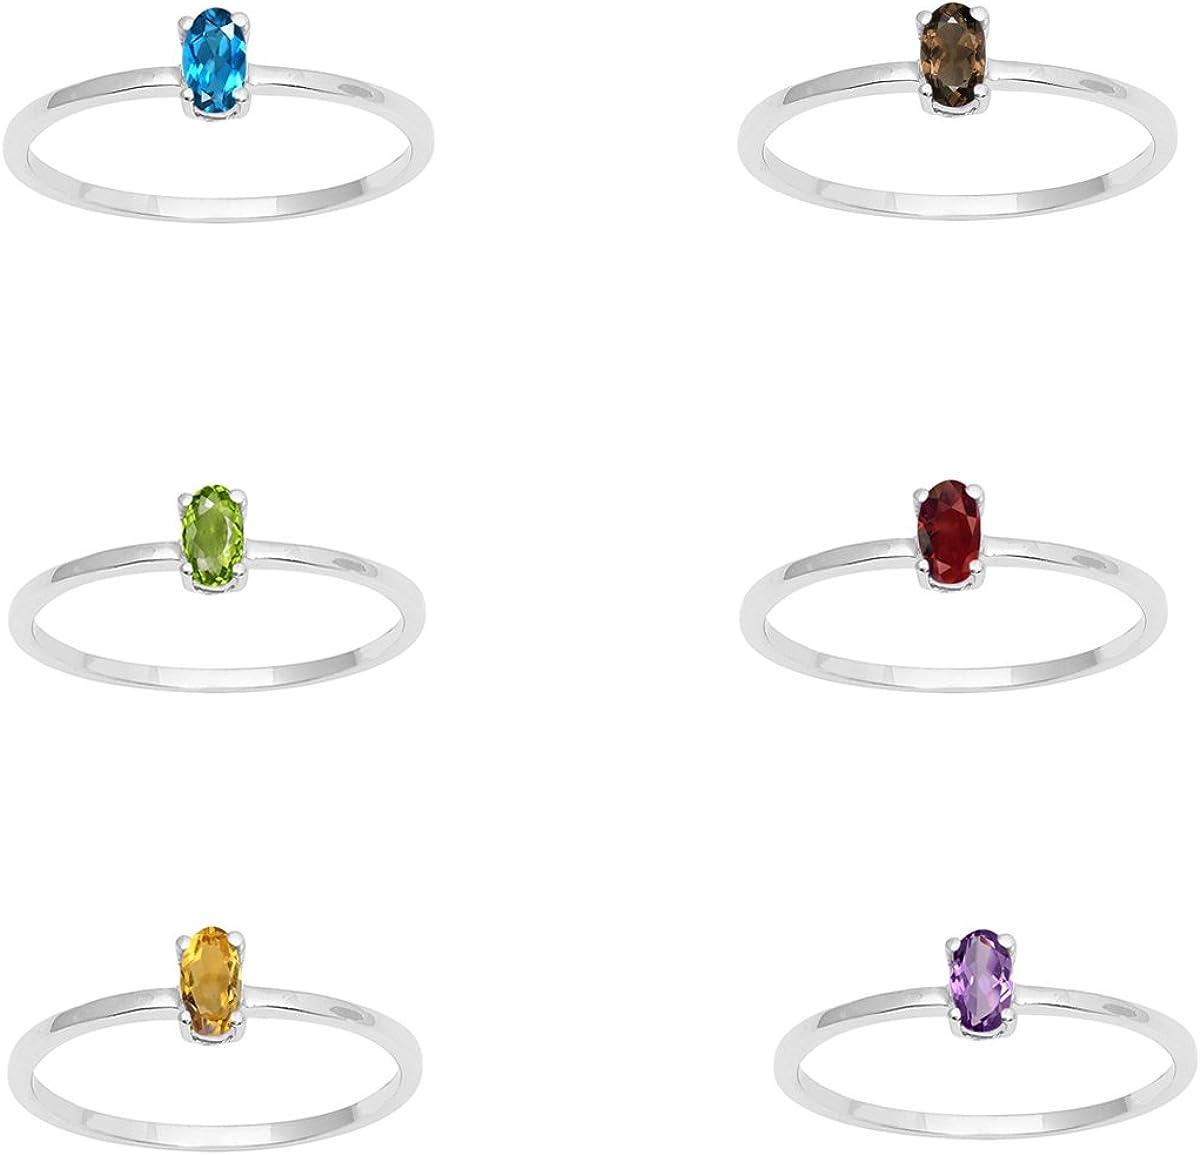 Shine Jewel Topacio Azul, poridot, Citrino, Ahumado, Granate, Amatista Piedra Solitario Mujeres Anillo Combinado 925 Joyas de Plata